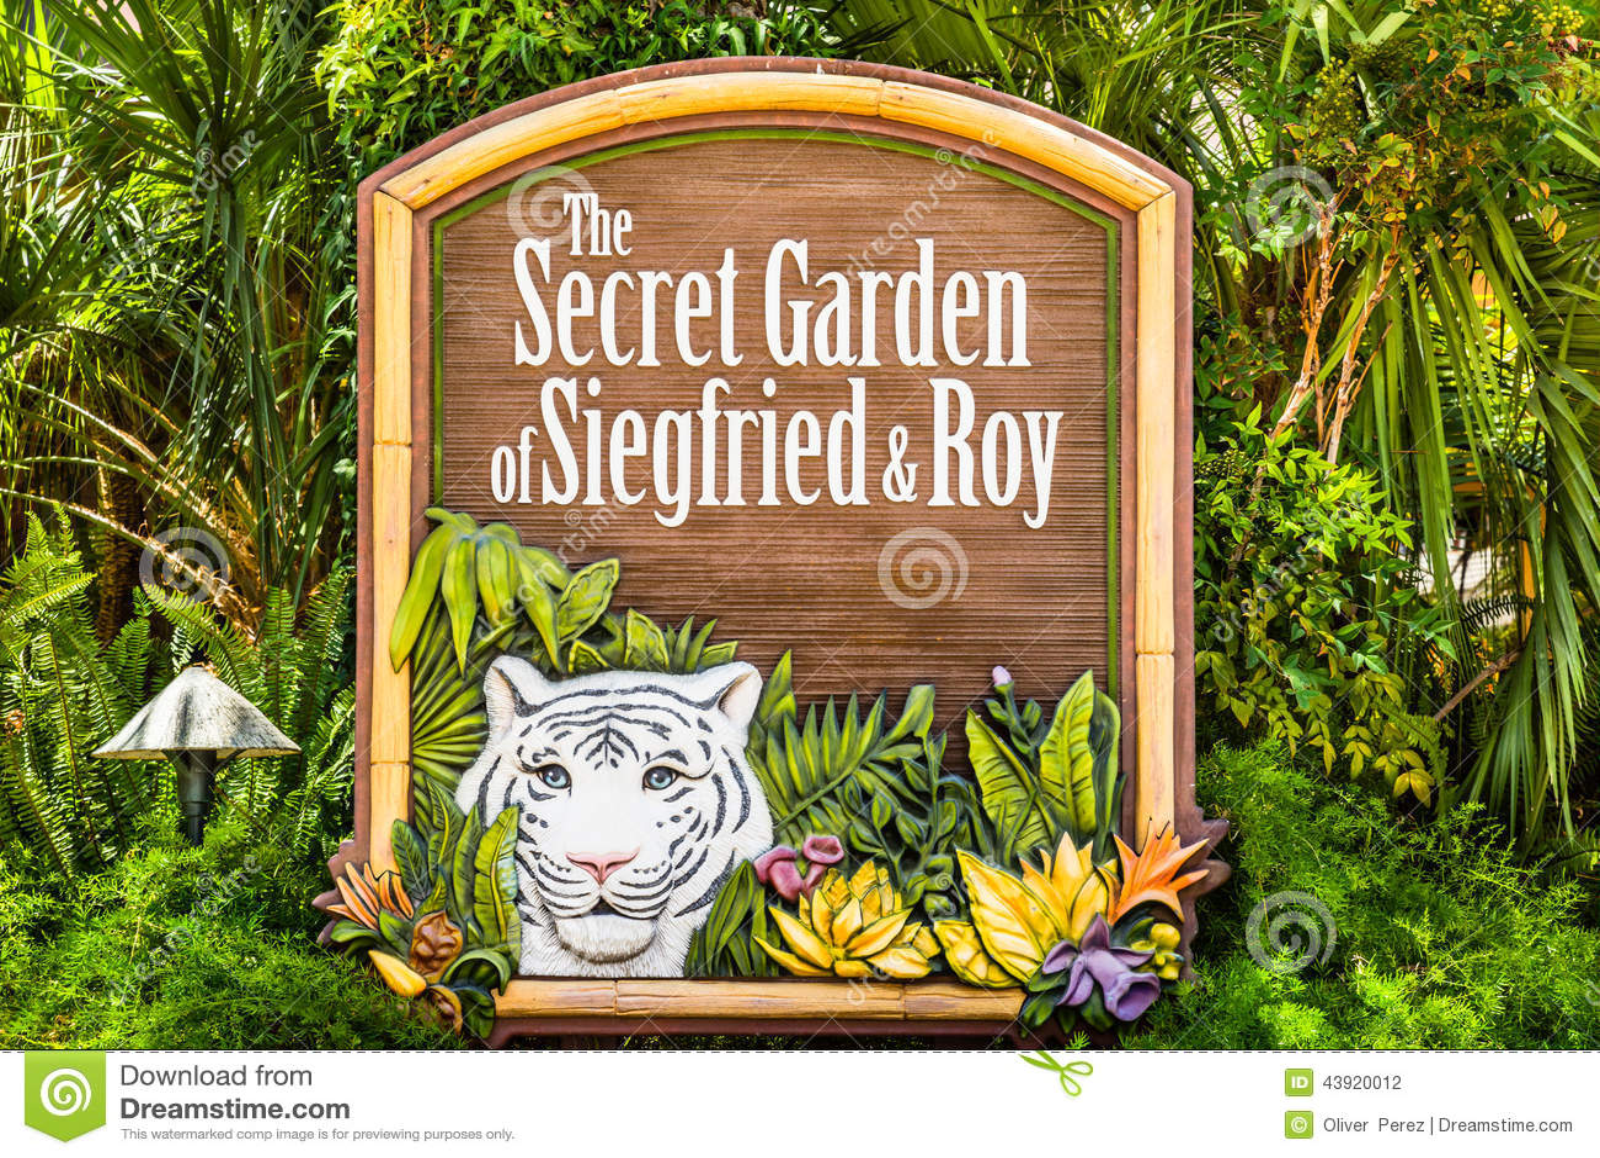 Image Result For Siegfried And Roy Secret Garden